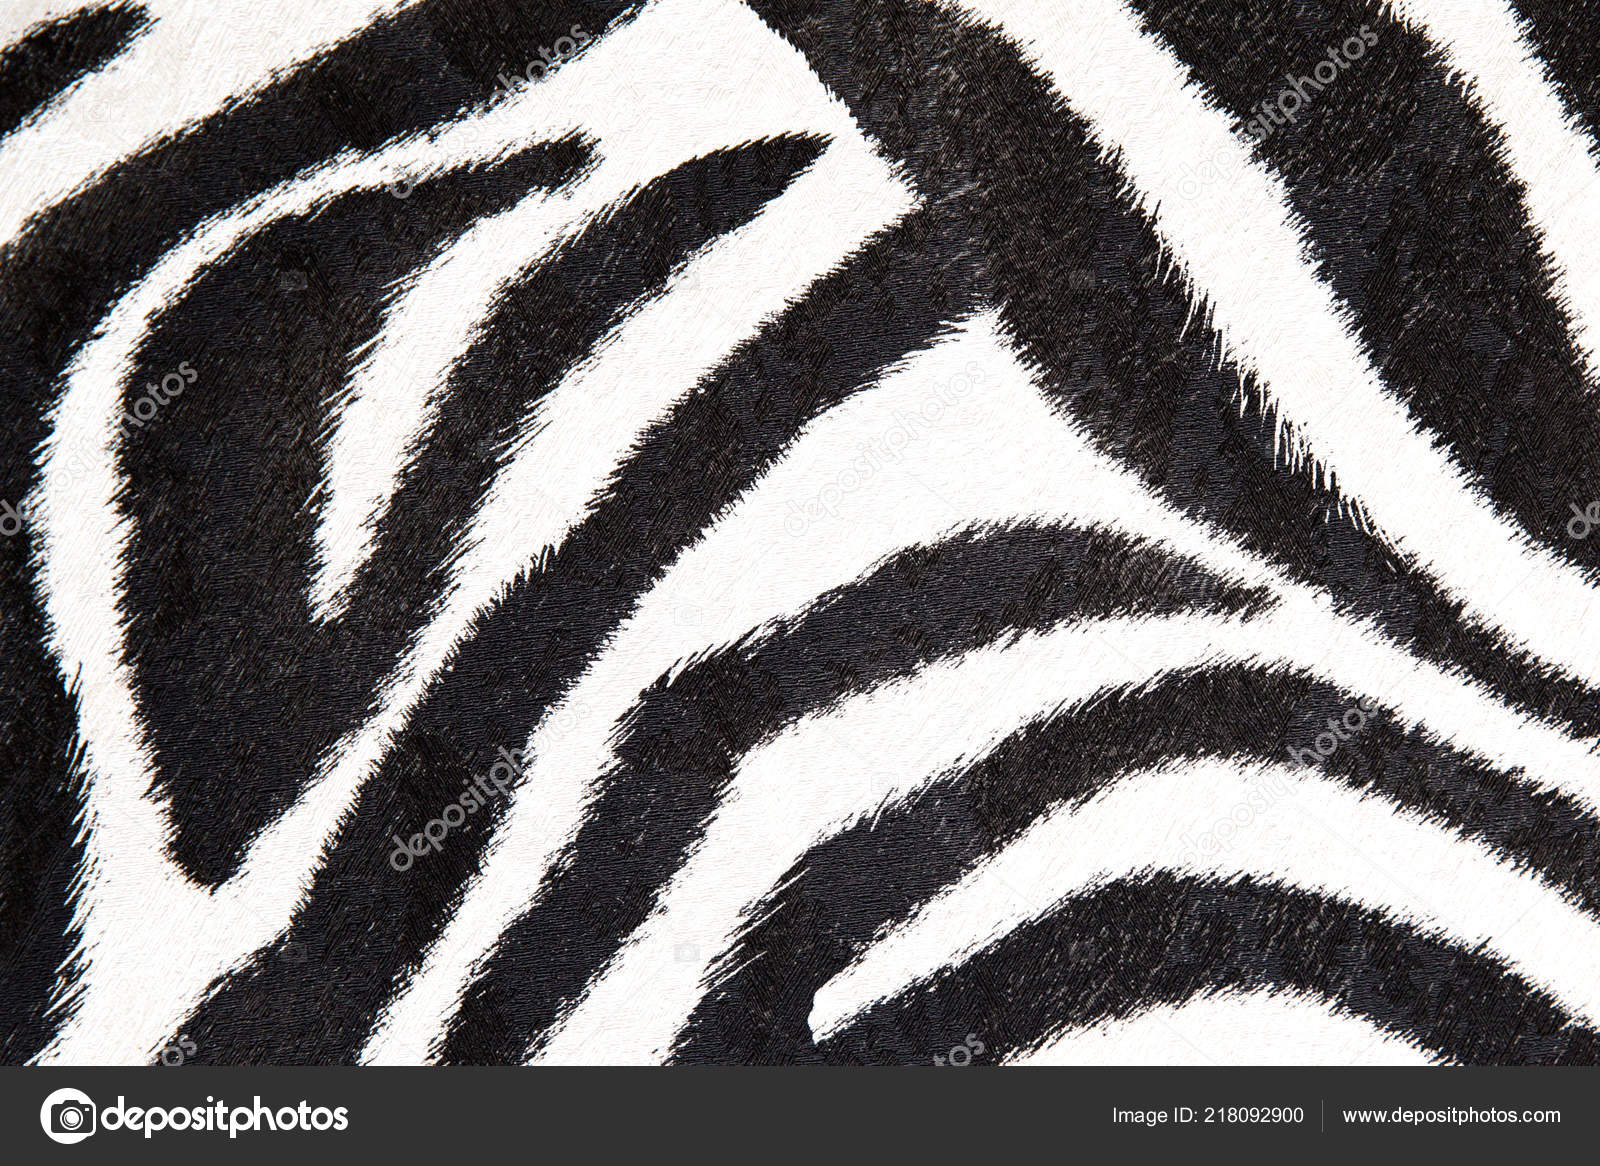 Zebra Background Black And White Texture For Your Design Stock Photo C Mariakray 218092900